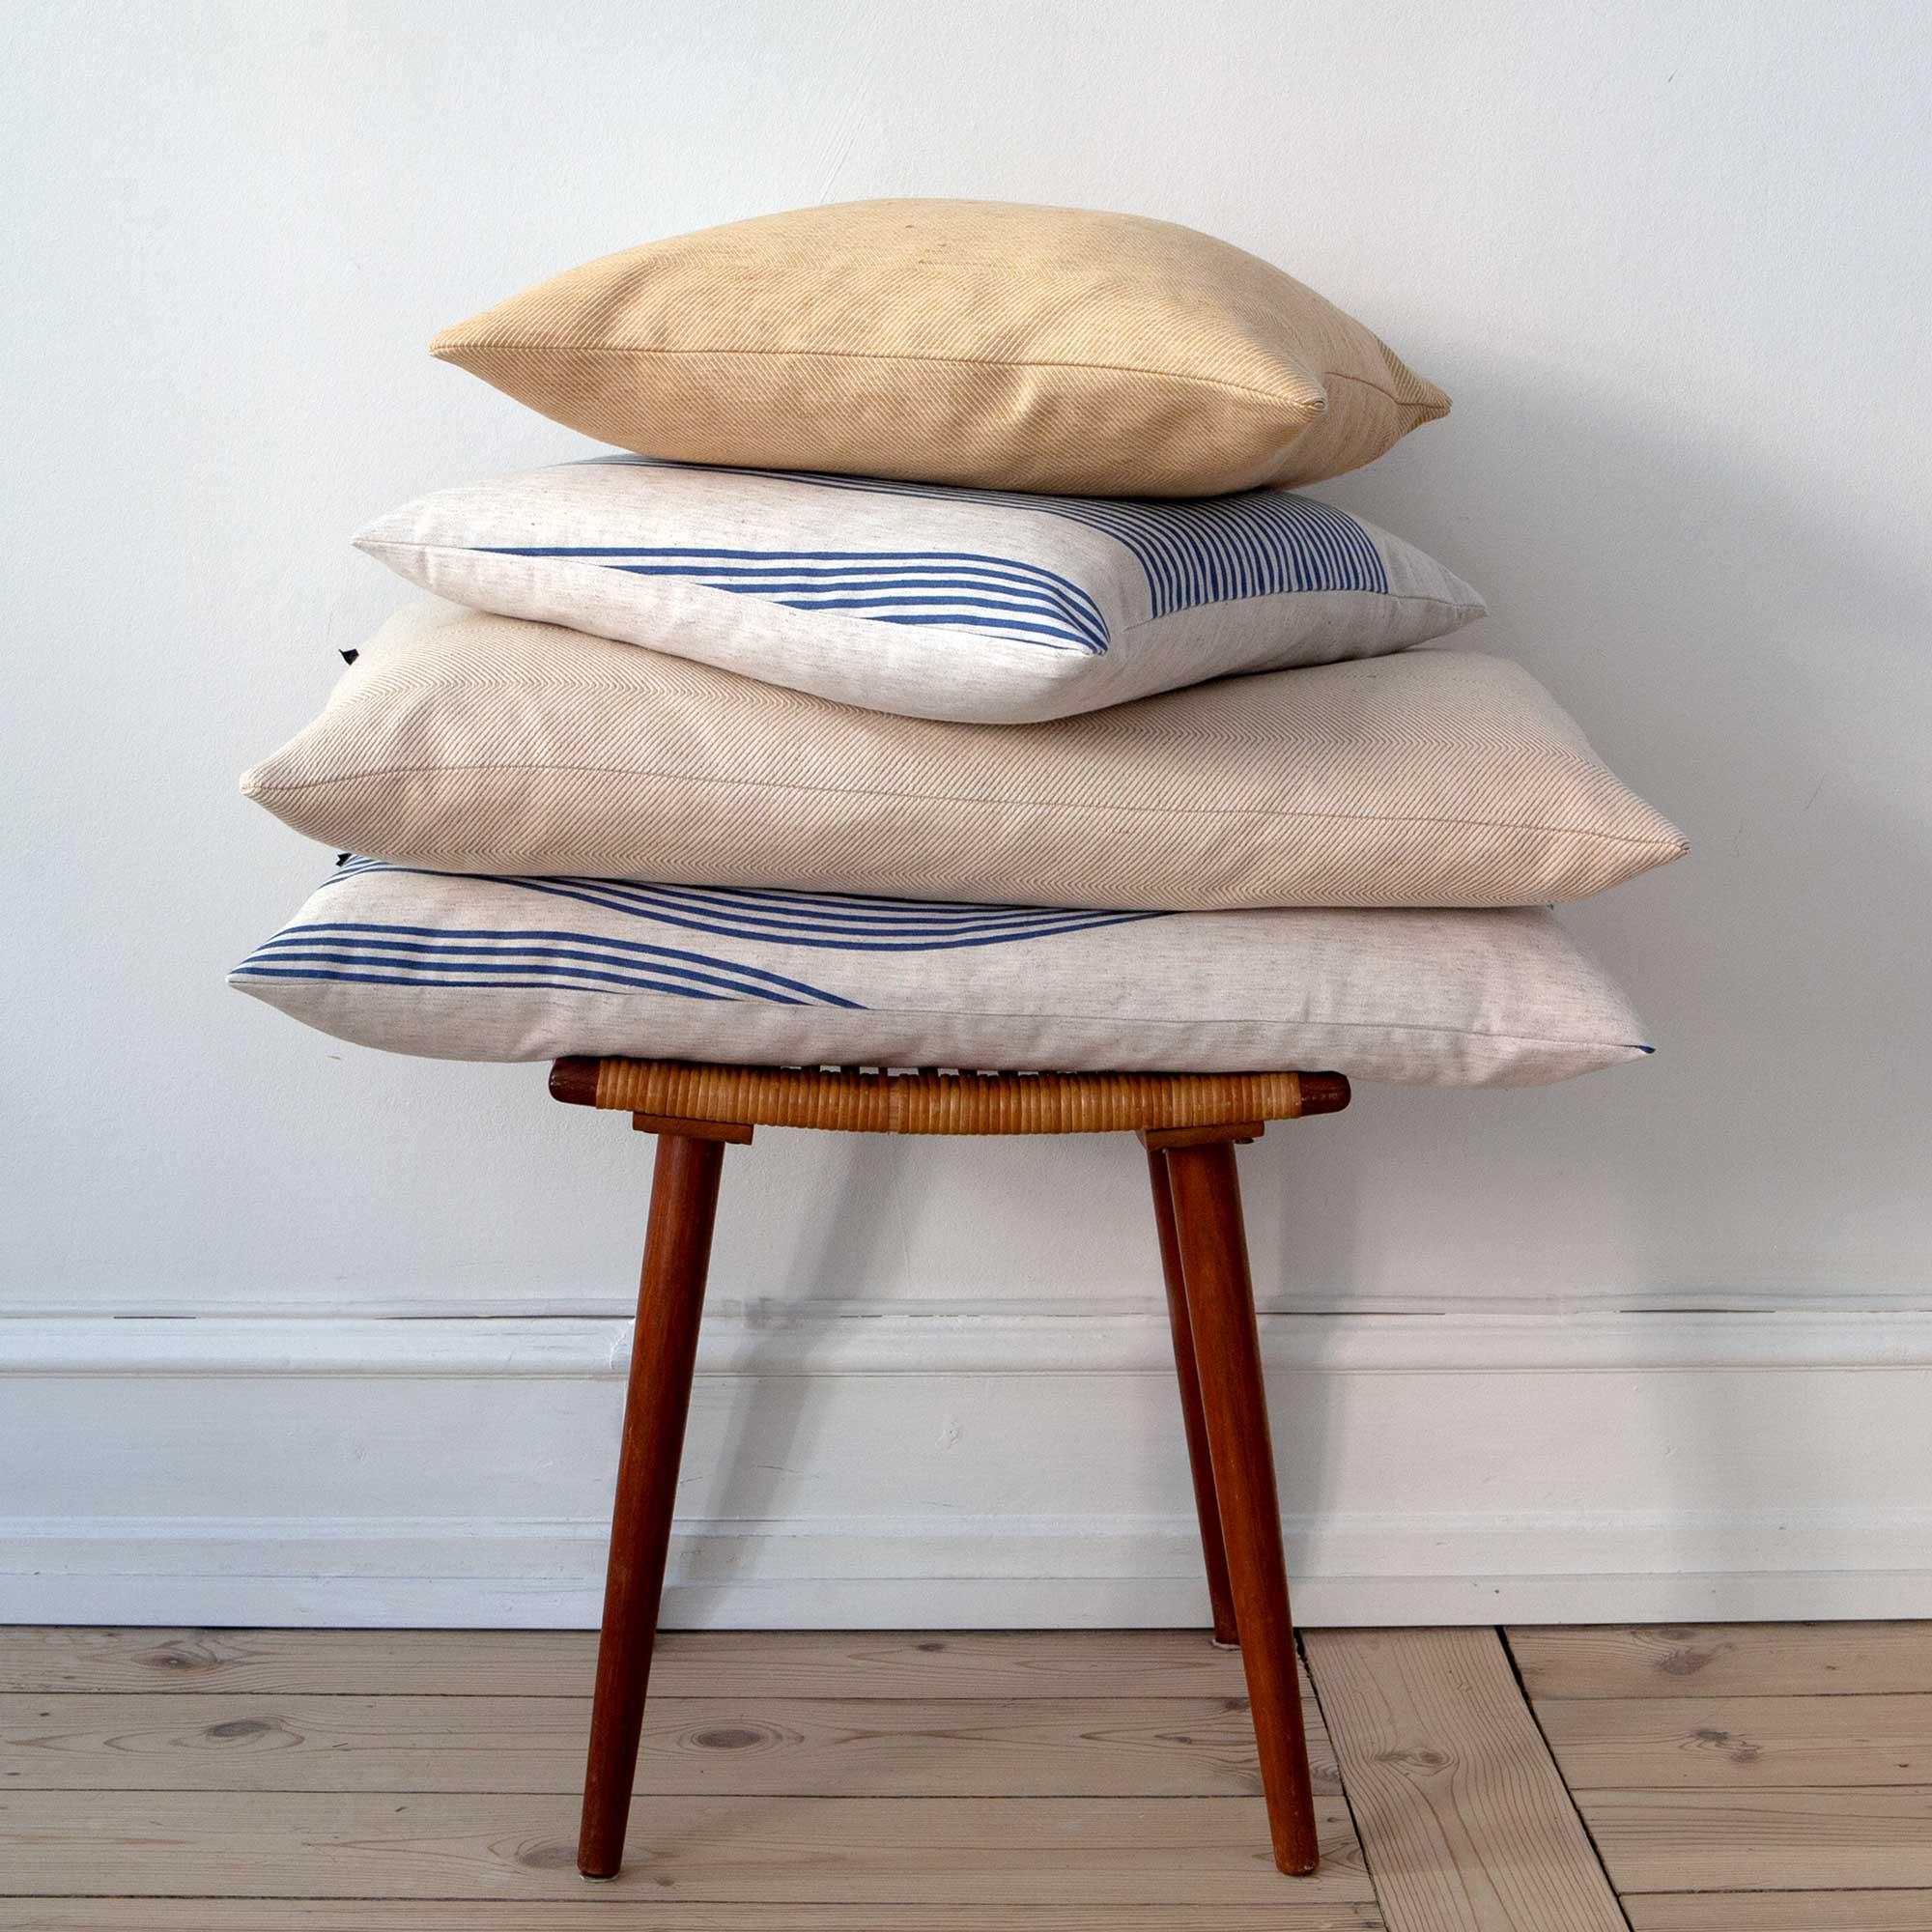 Rectangular cushions in river pattern, hay yellow and indigo herringbone weave, design by Anne Rosenberg, RosenbergCph